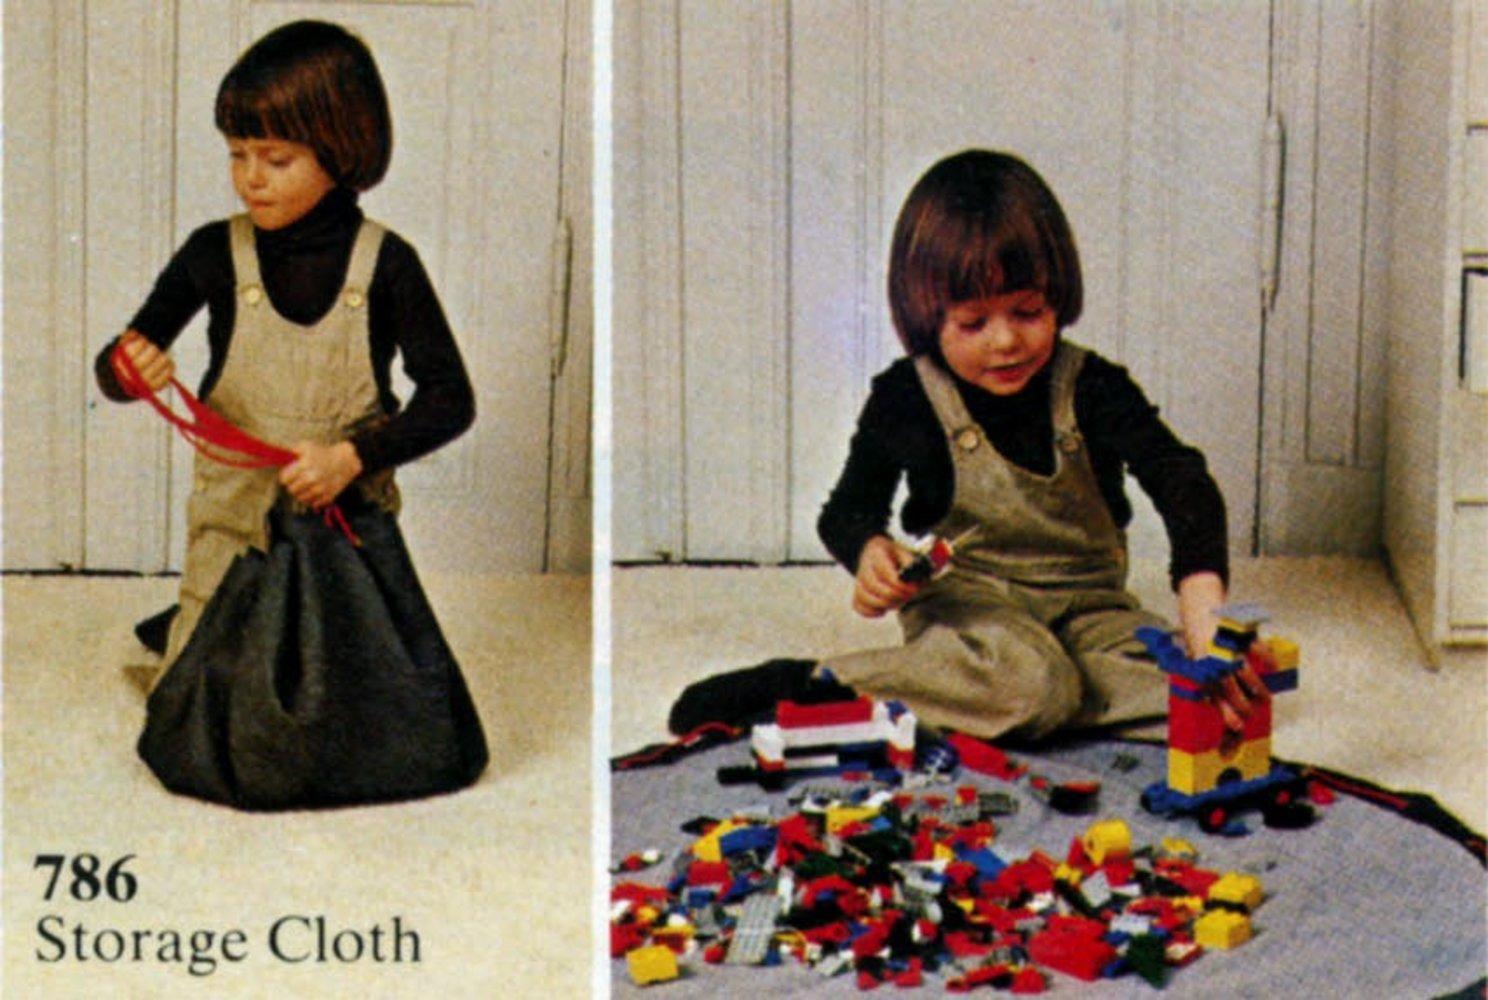 Storage Cloth